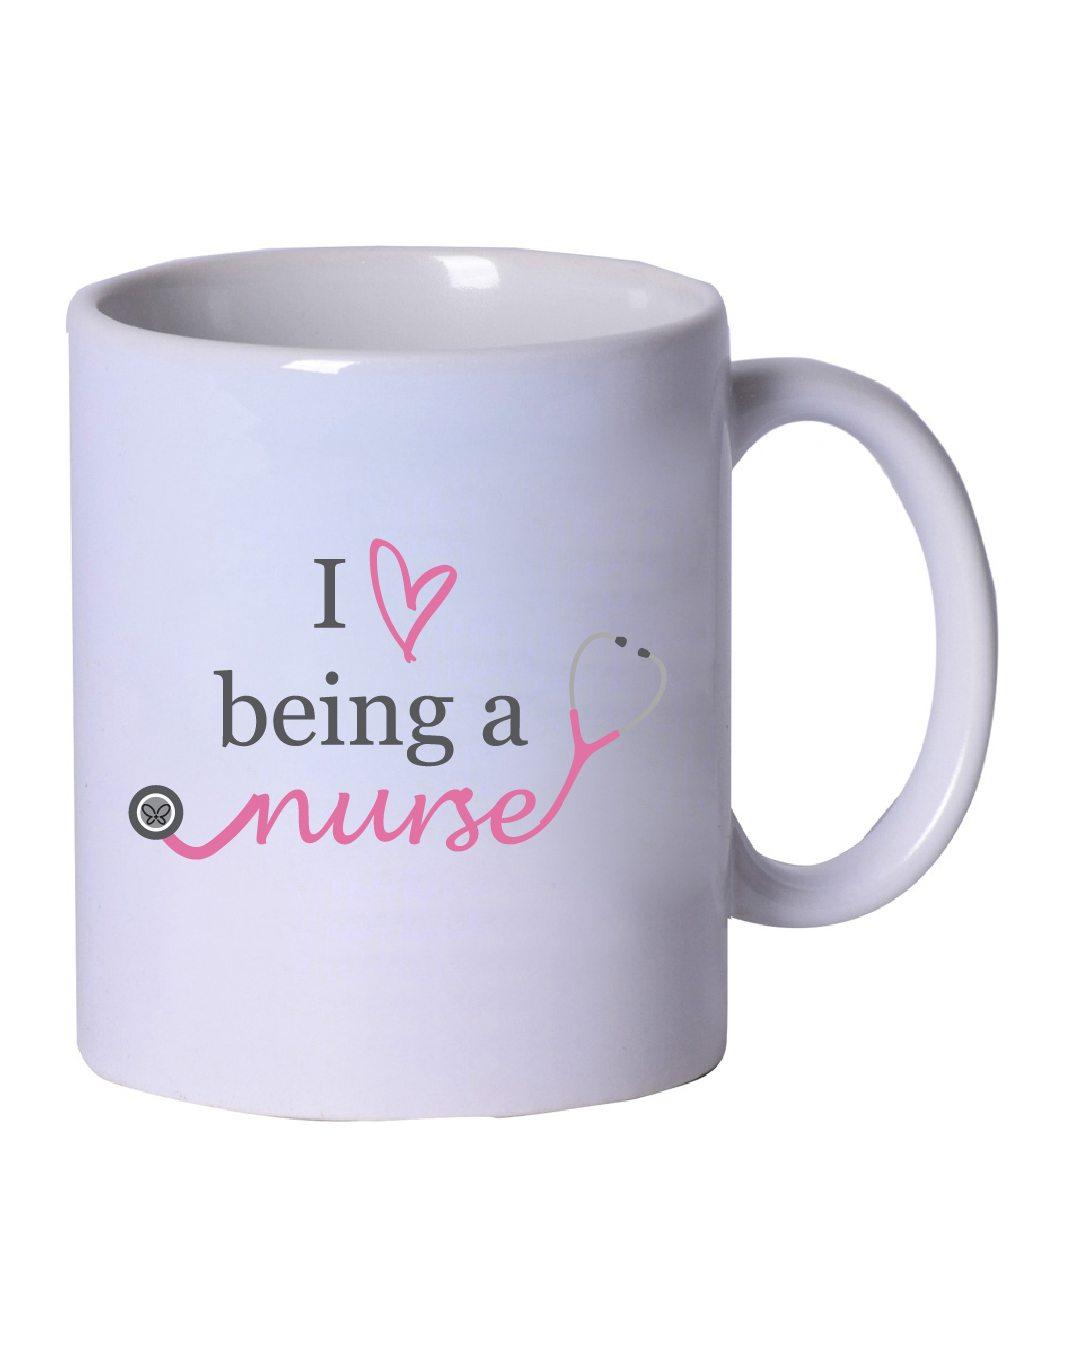 Love-Being-a-Nurse-Mug-01.jpg